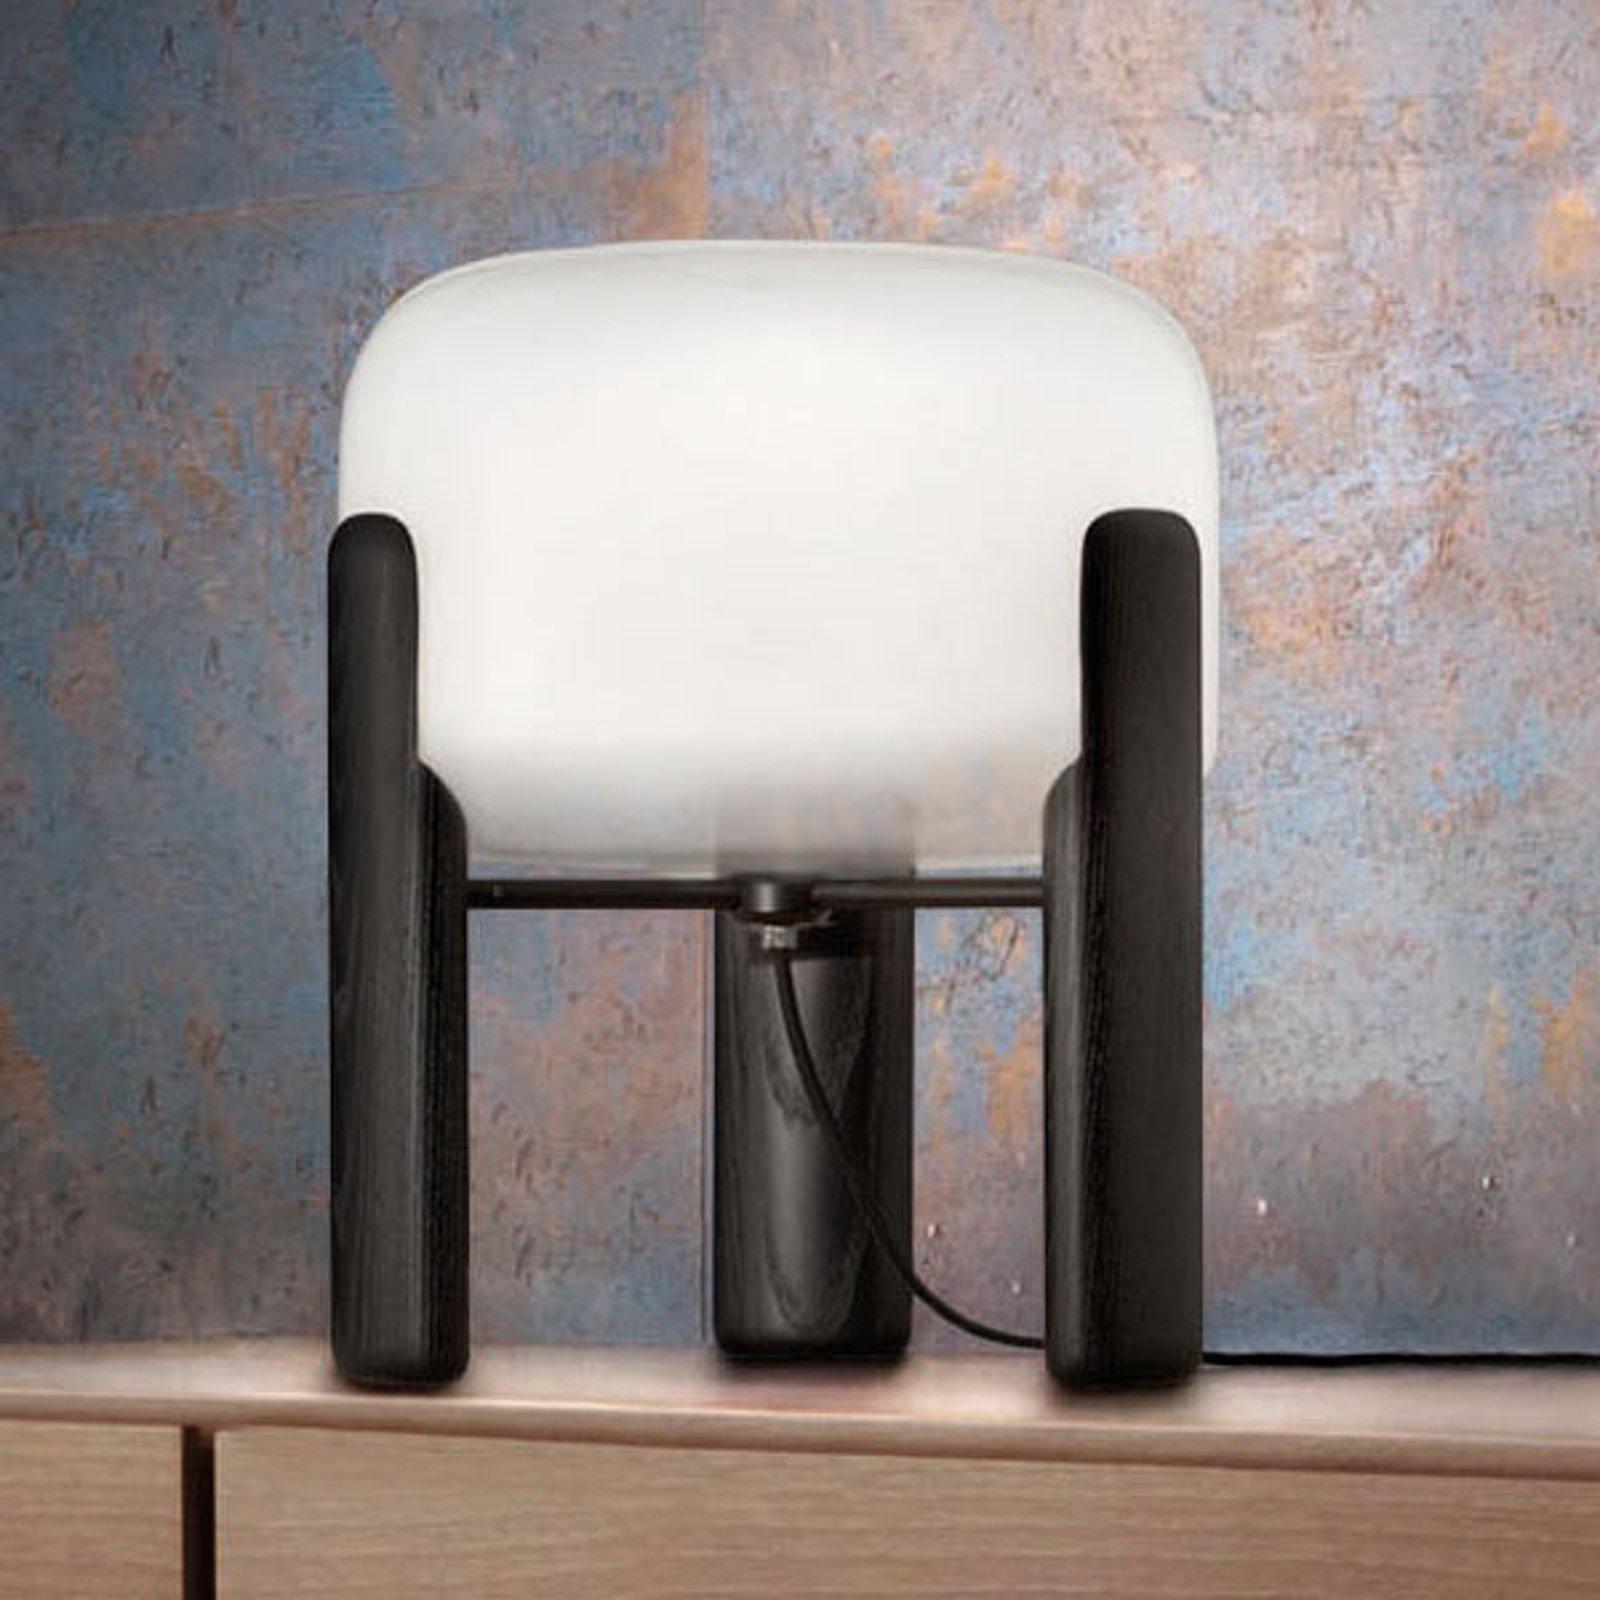 Bordlampe Sata skjerm i hvit, fot i svart